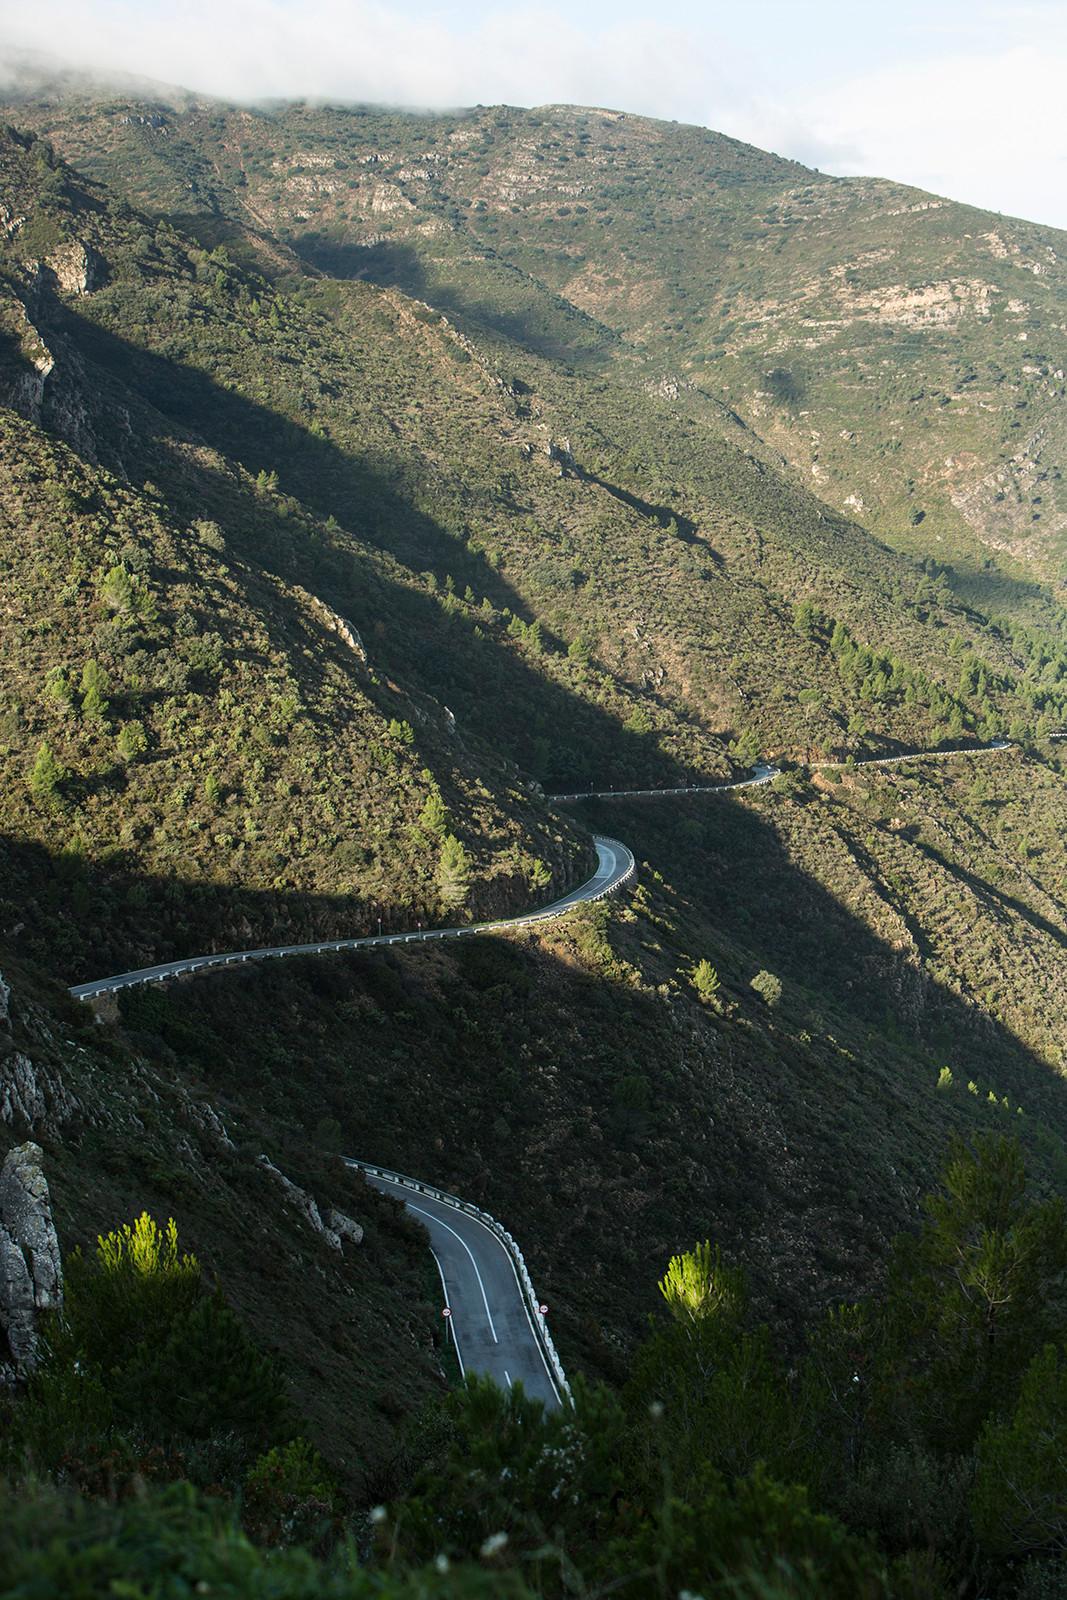 Mountain road, Sierra de Bernia, Tarbena Spain